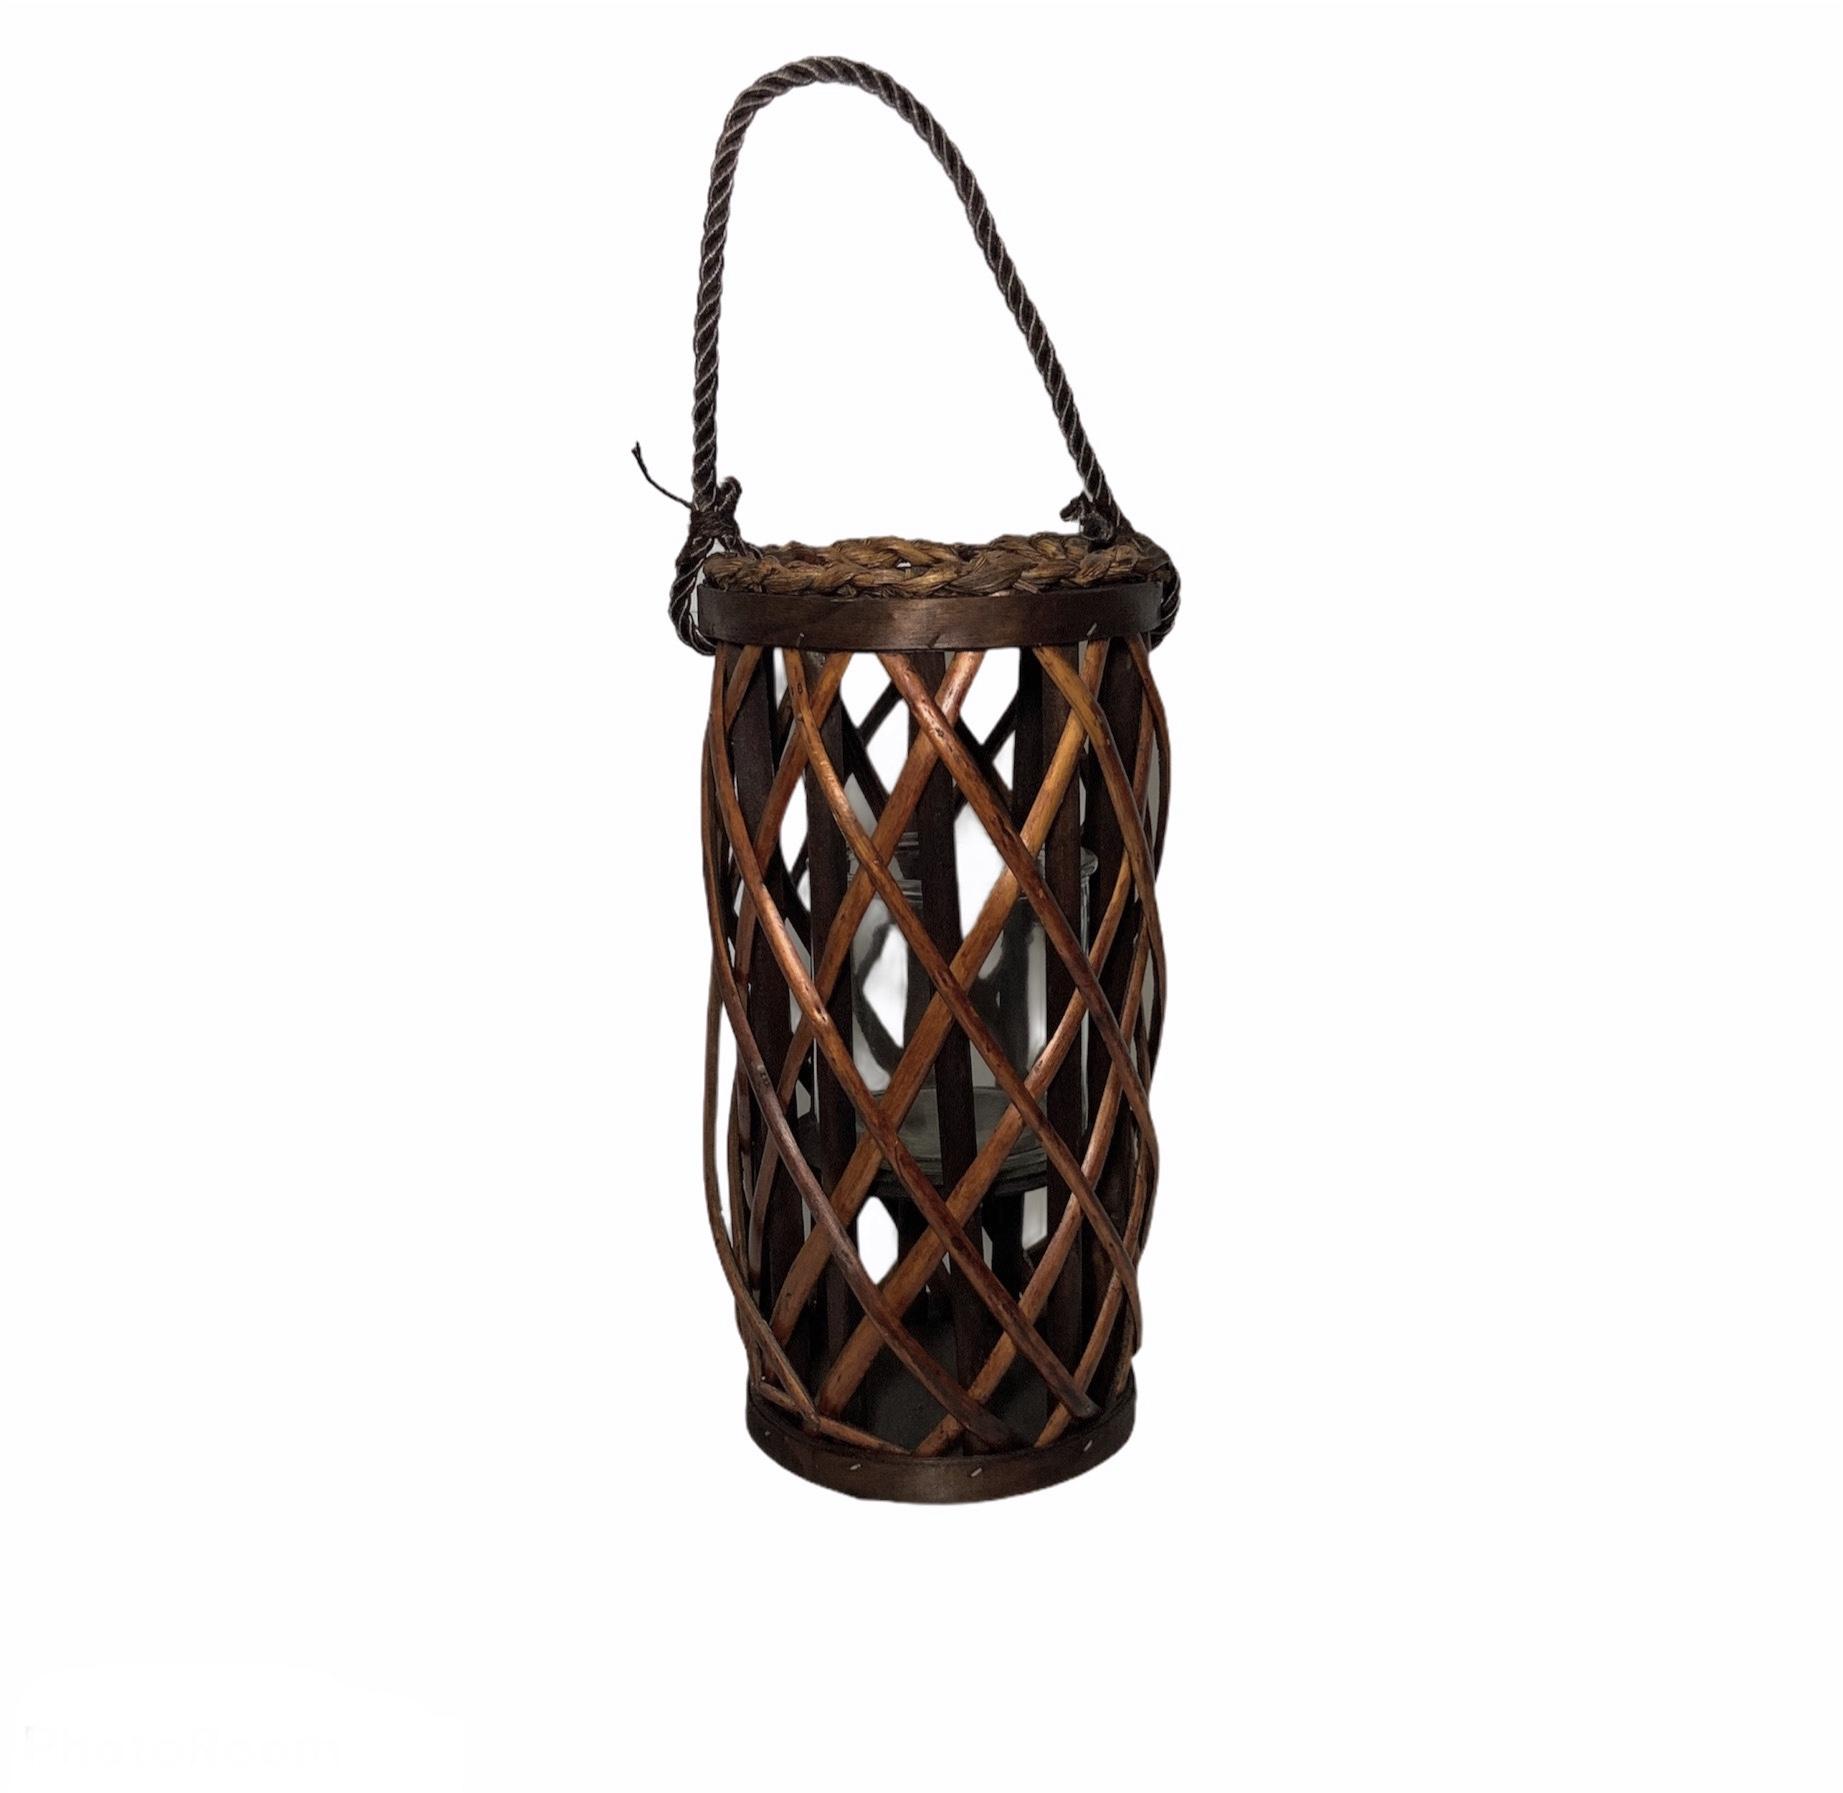 31570-farol-madera-cuerda-31-cm.jpeg